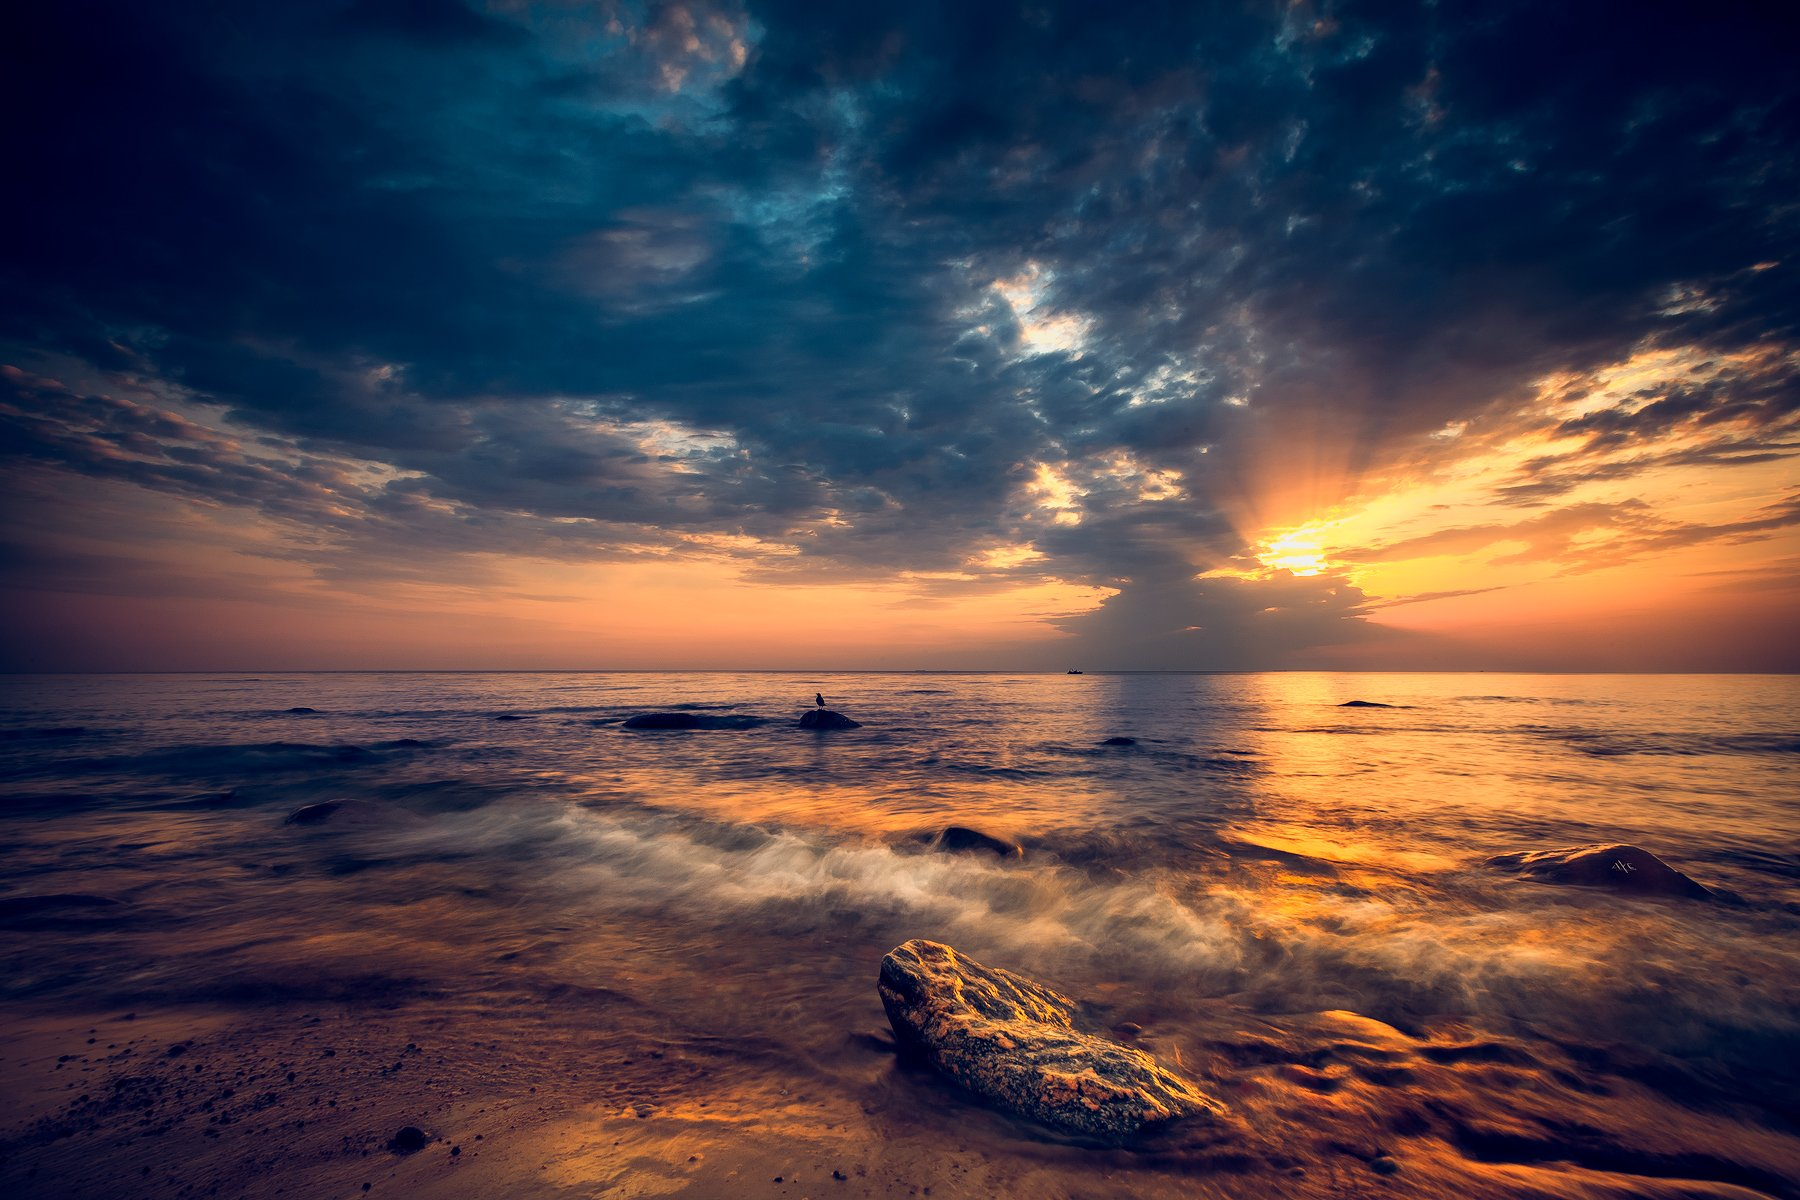 baltic sea, sunset, colors, seascape, wave, Руслан Болгов (Axe)